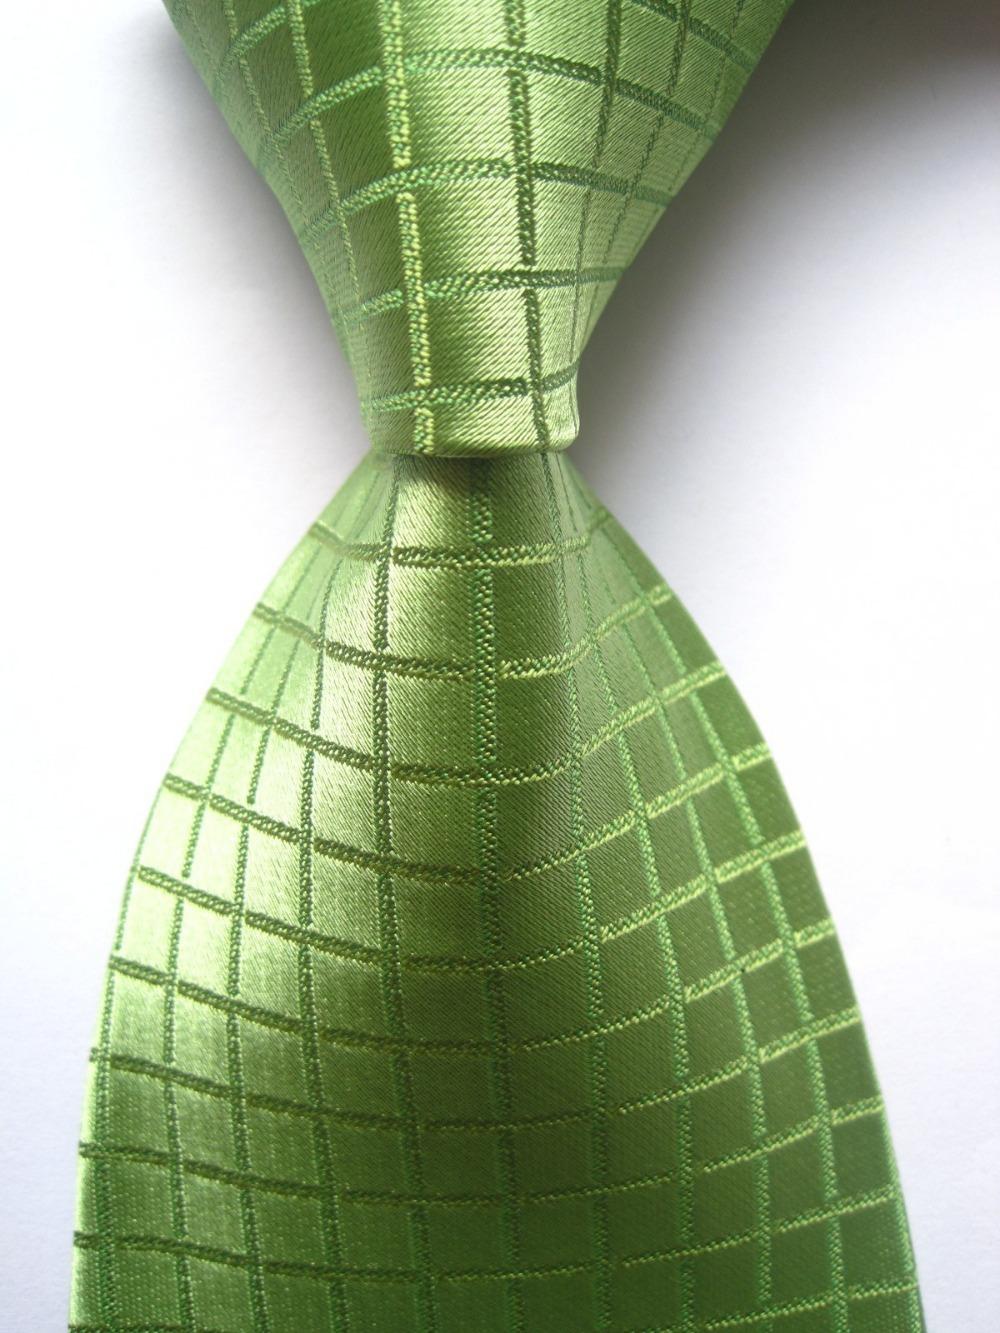 New Classic Checks Green JACQUARD WOVEN 100% Silk Men's Tie Necktie SN421(China (Mainland))